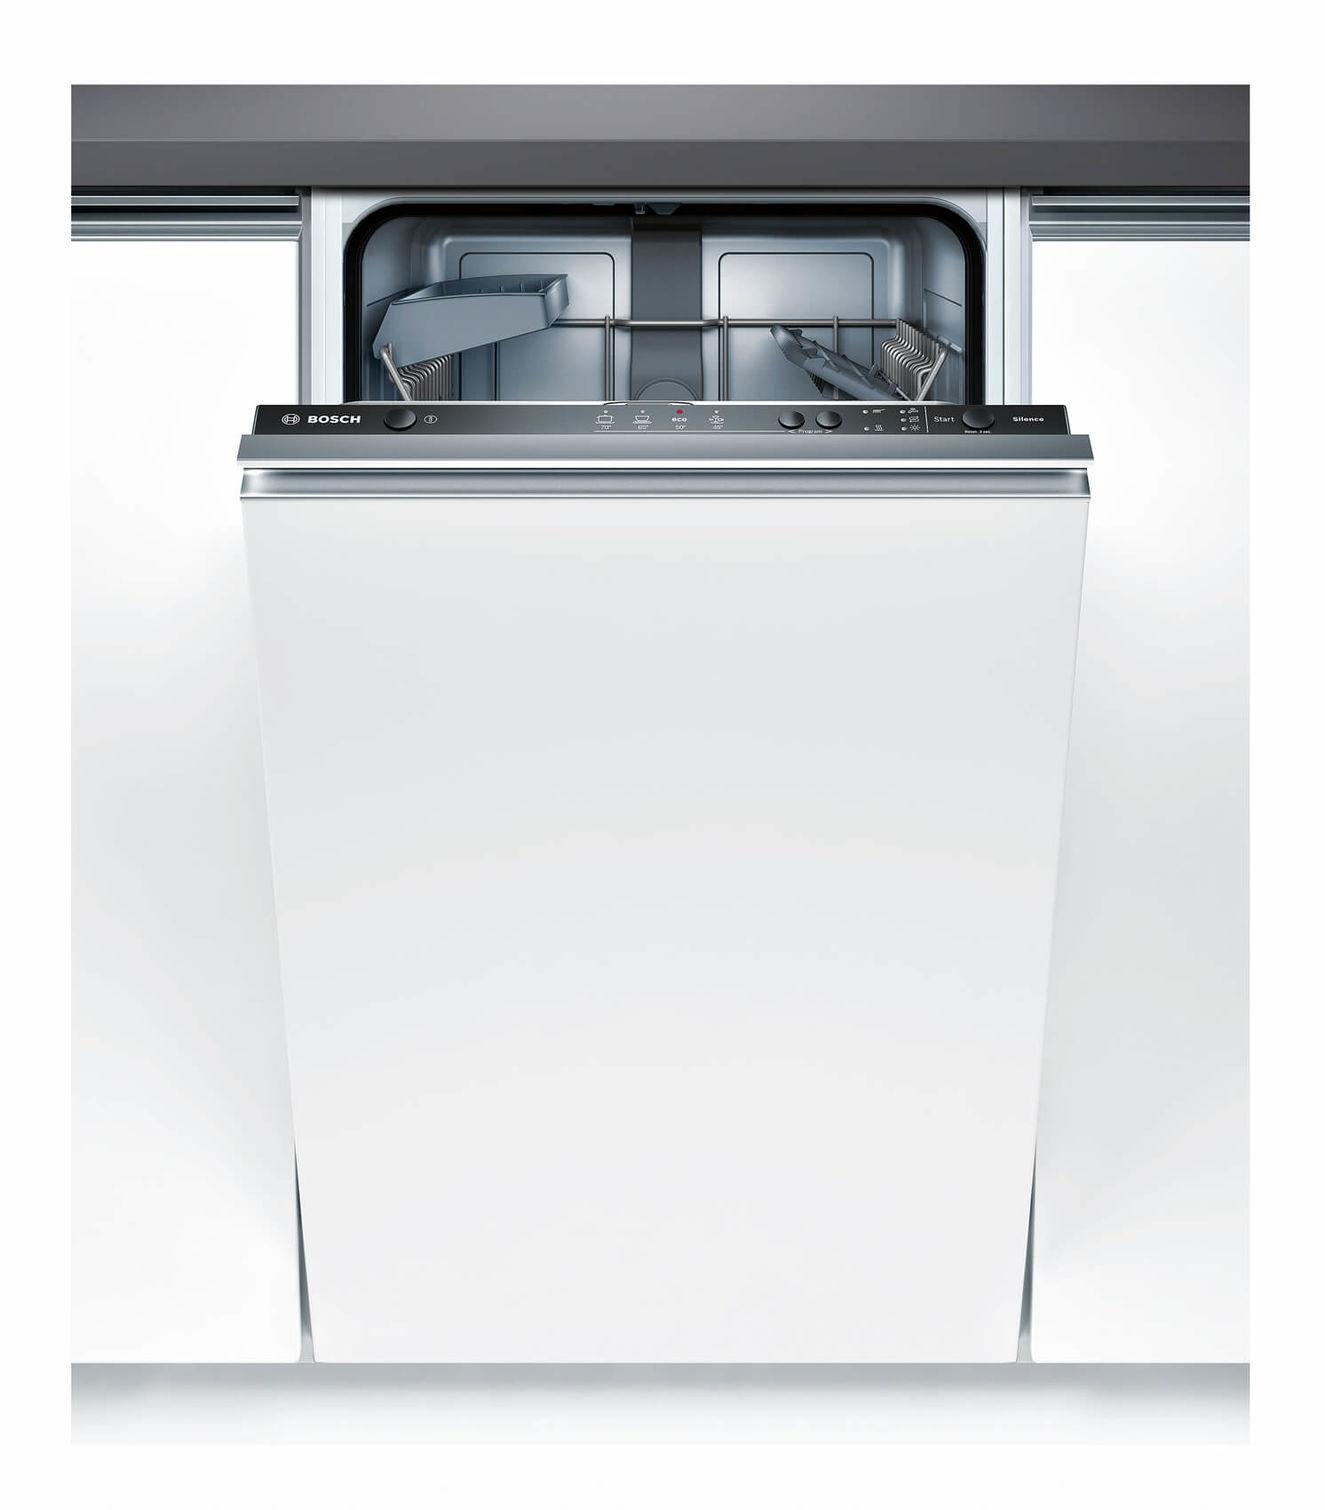 Bosch SPV40E40EU dishwasher